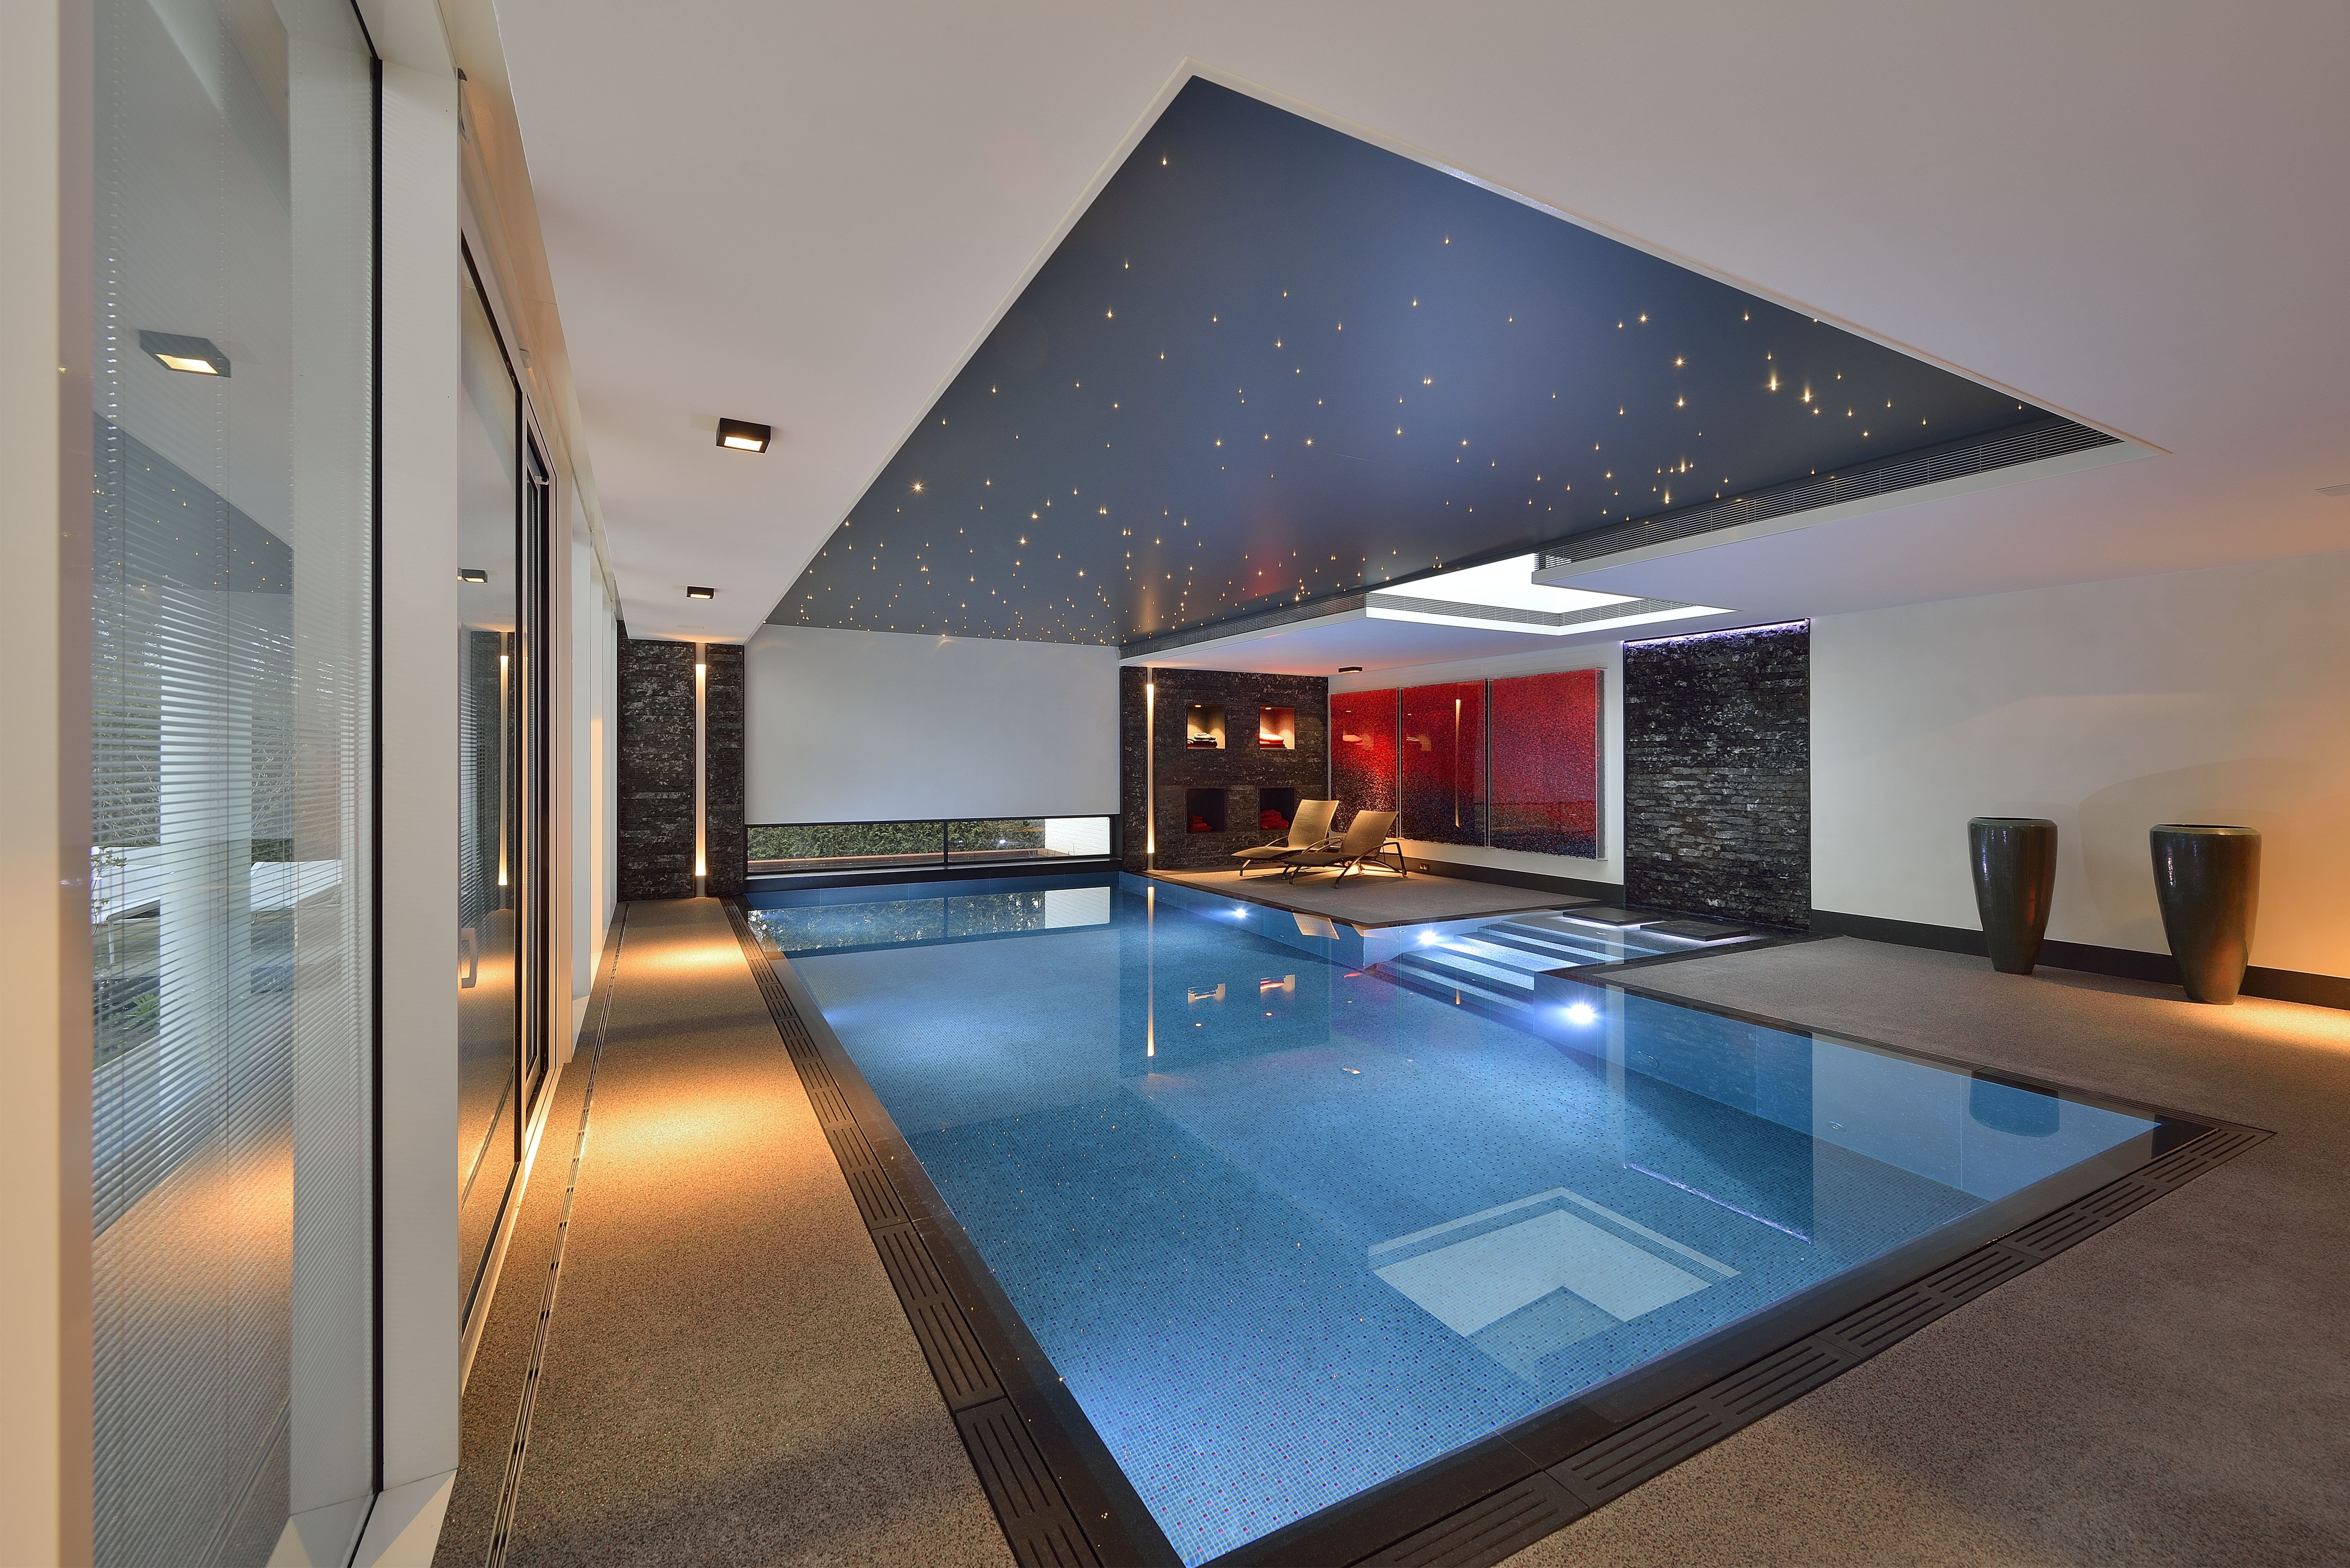 domotica swimmingpool, domotica zwembad, binnenzwembad, villa, home automation, lichtplan, lightdesign, home architecture, interieur, interior